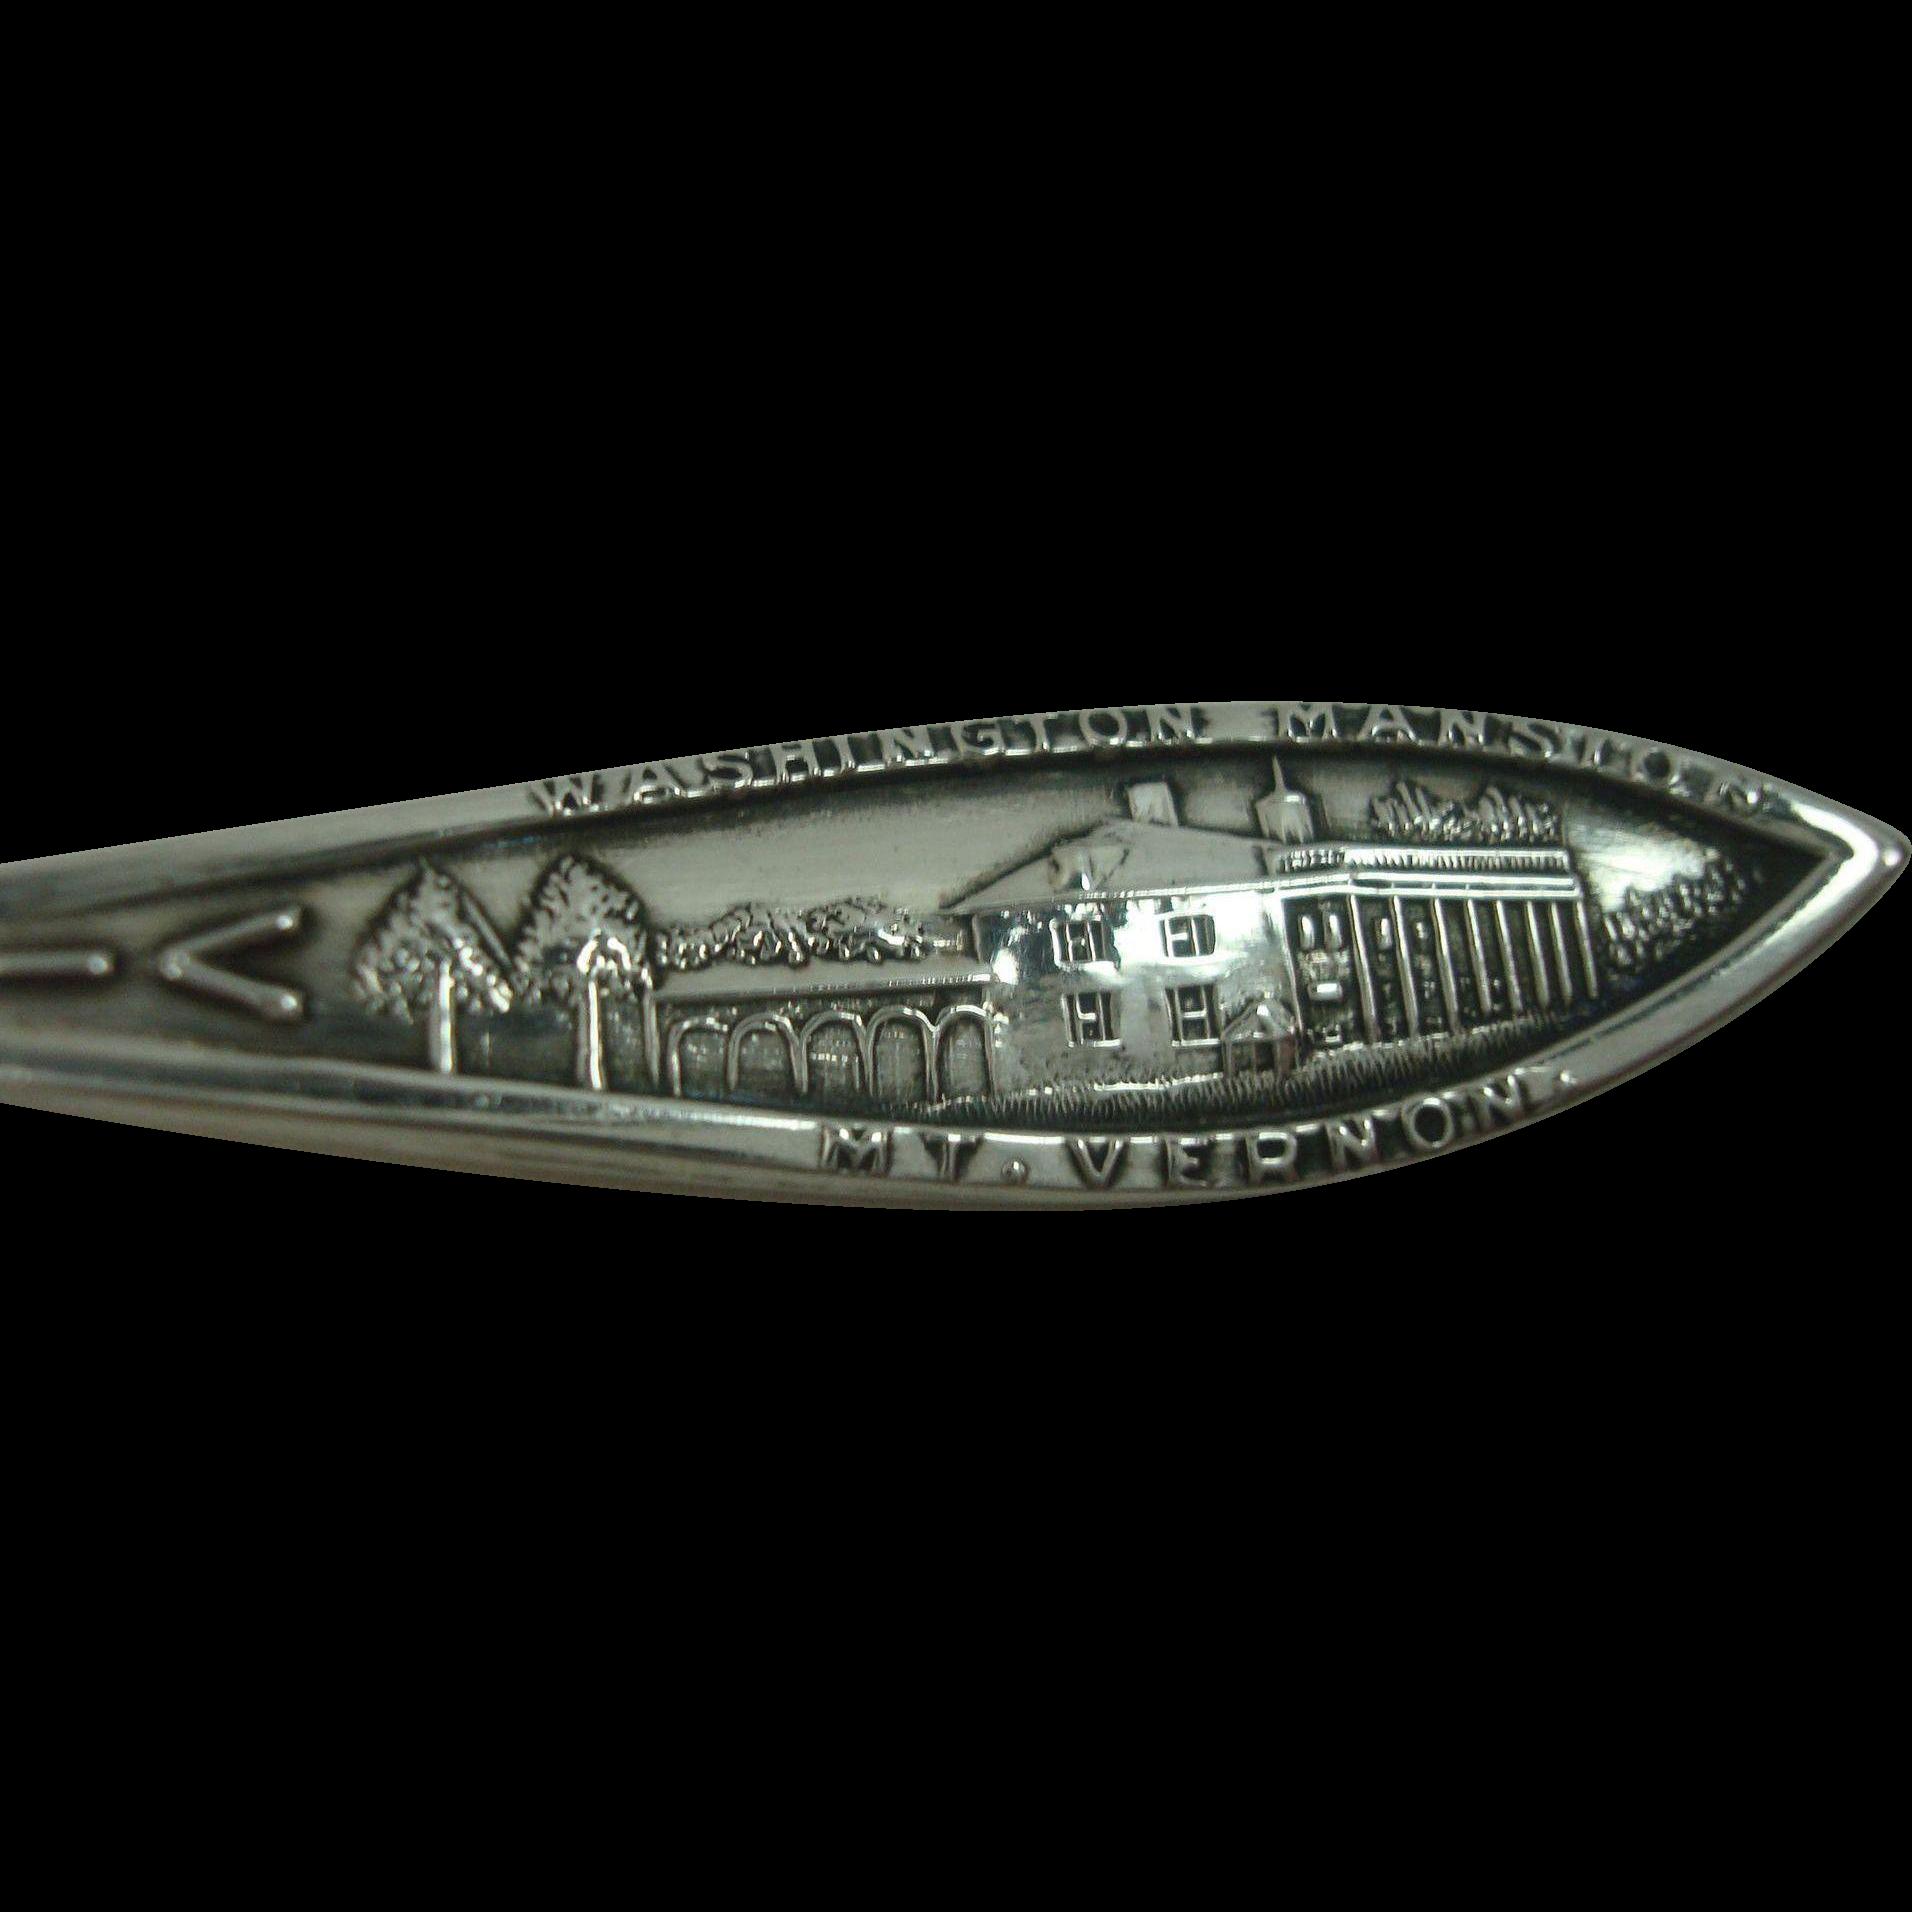 Virginia Mt Vernon Washington Mansion Sterling Souvenir Demitasse Spoon